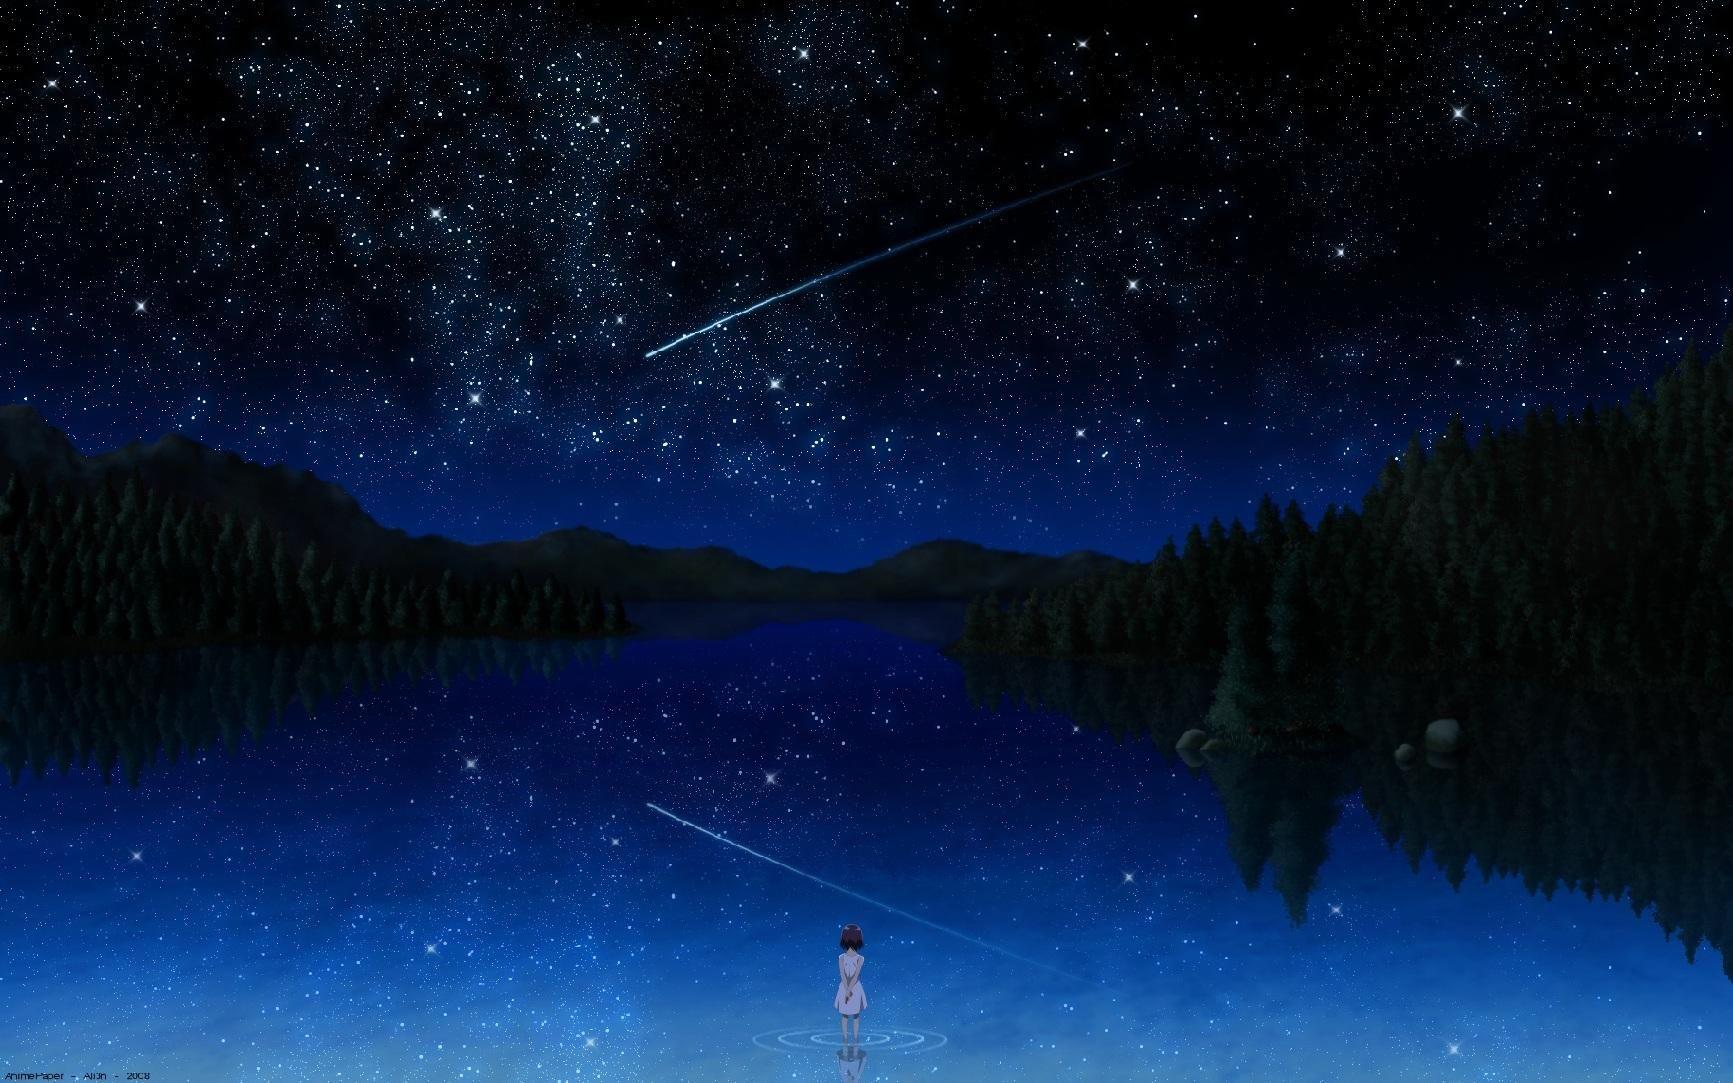 Water Nature Anime girls Anime Shooting stars HD Wallpapers 1733x1083